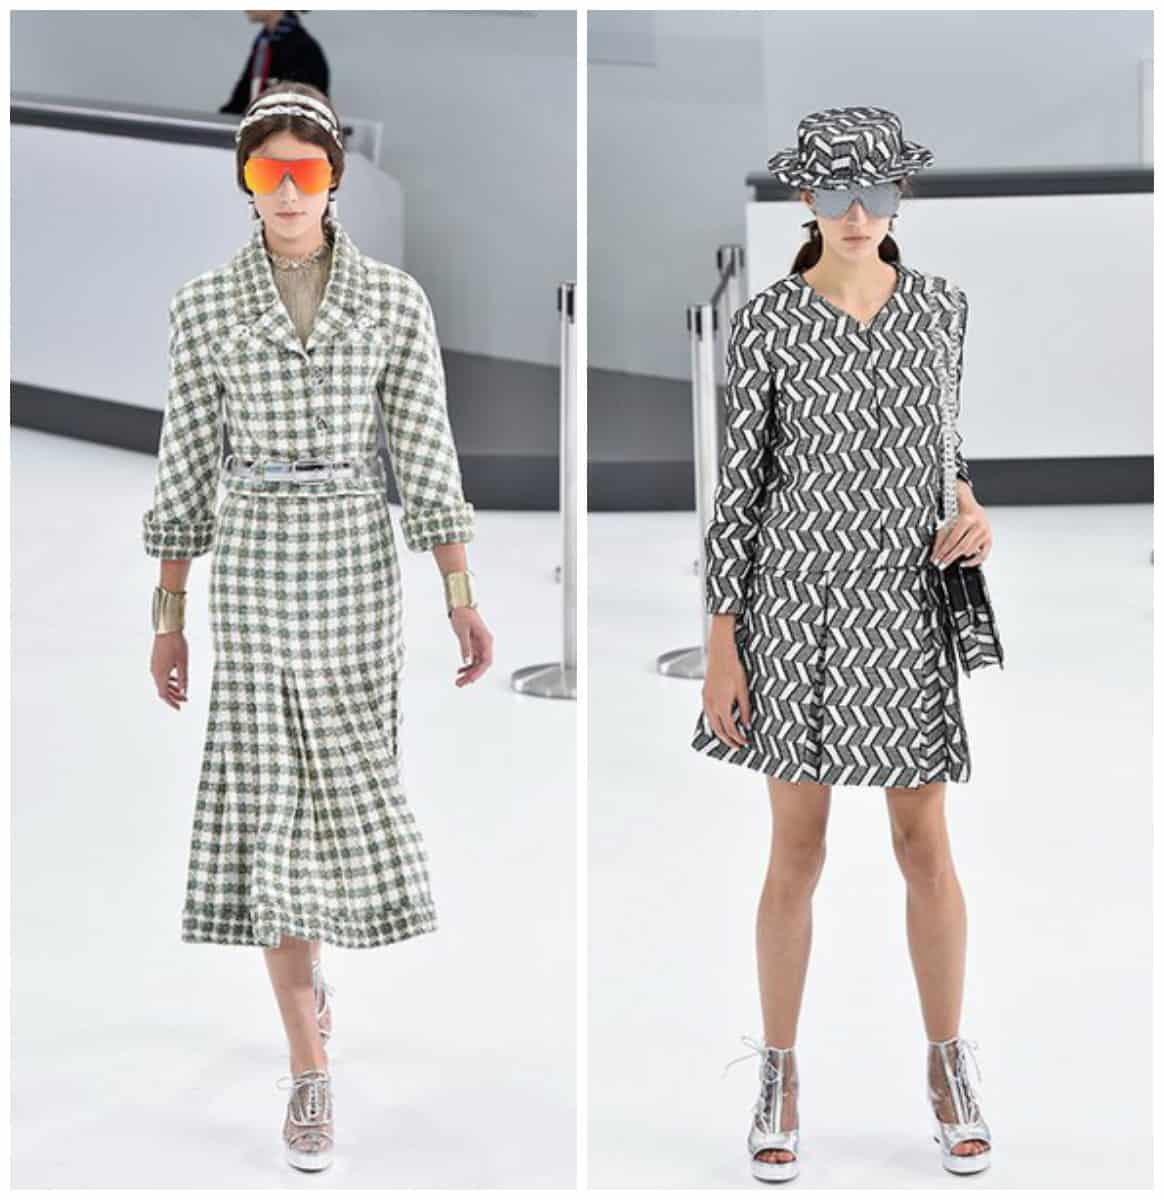 Paris-Fashion-Week-Chanel-show-Spring-Summer-2016-9